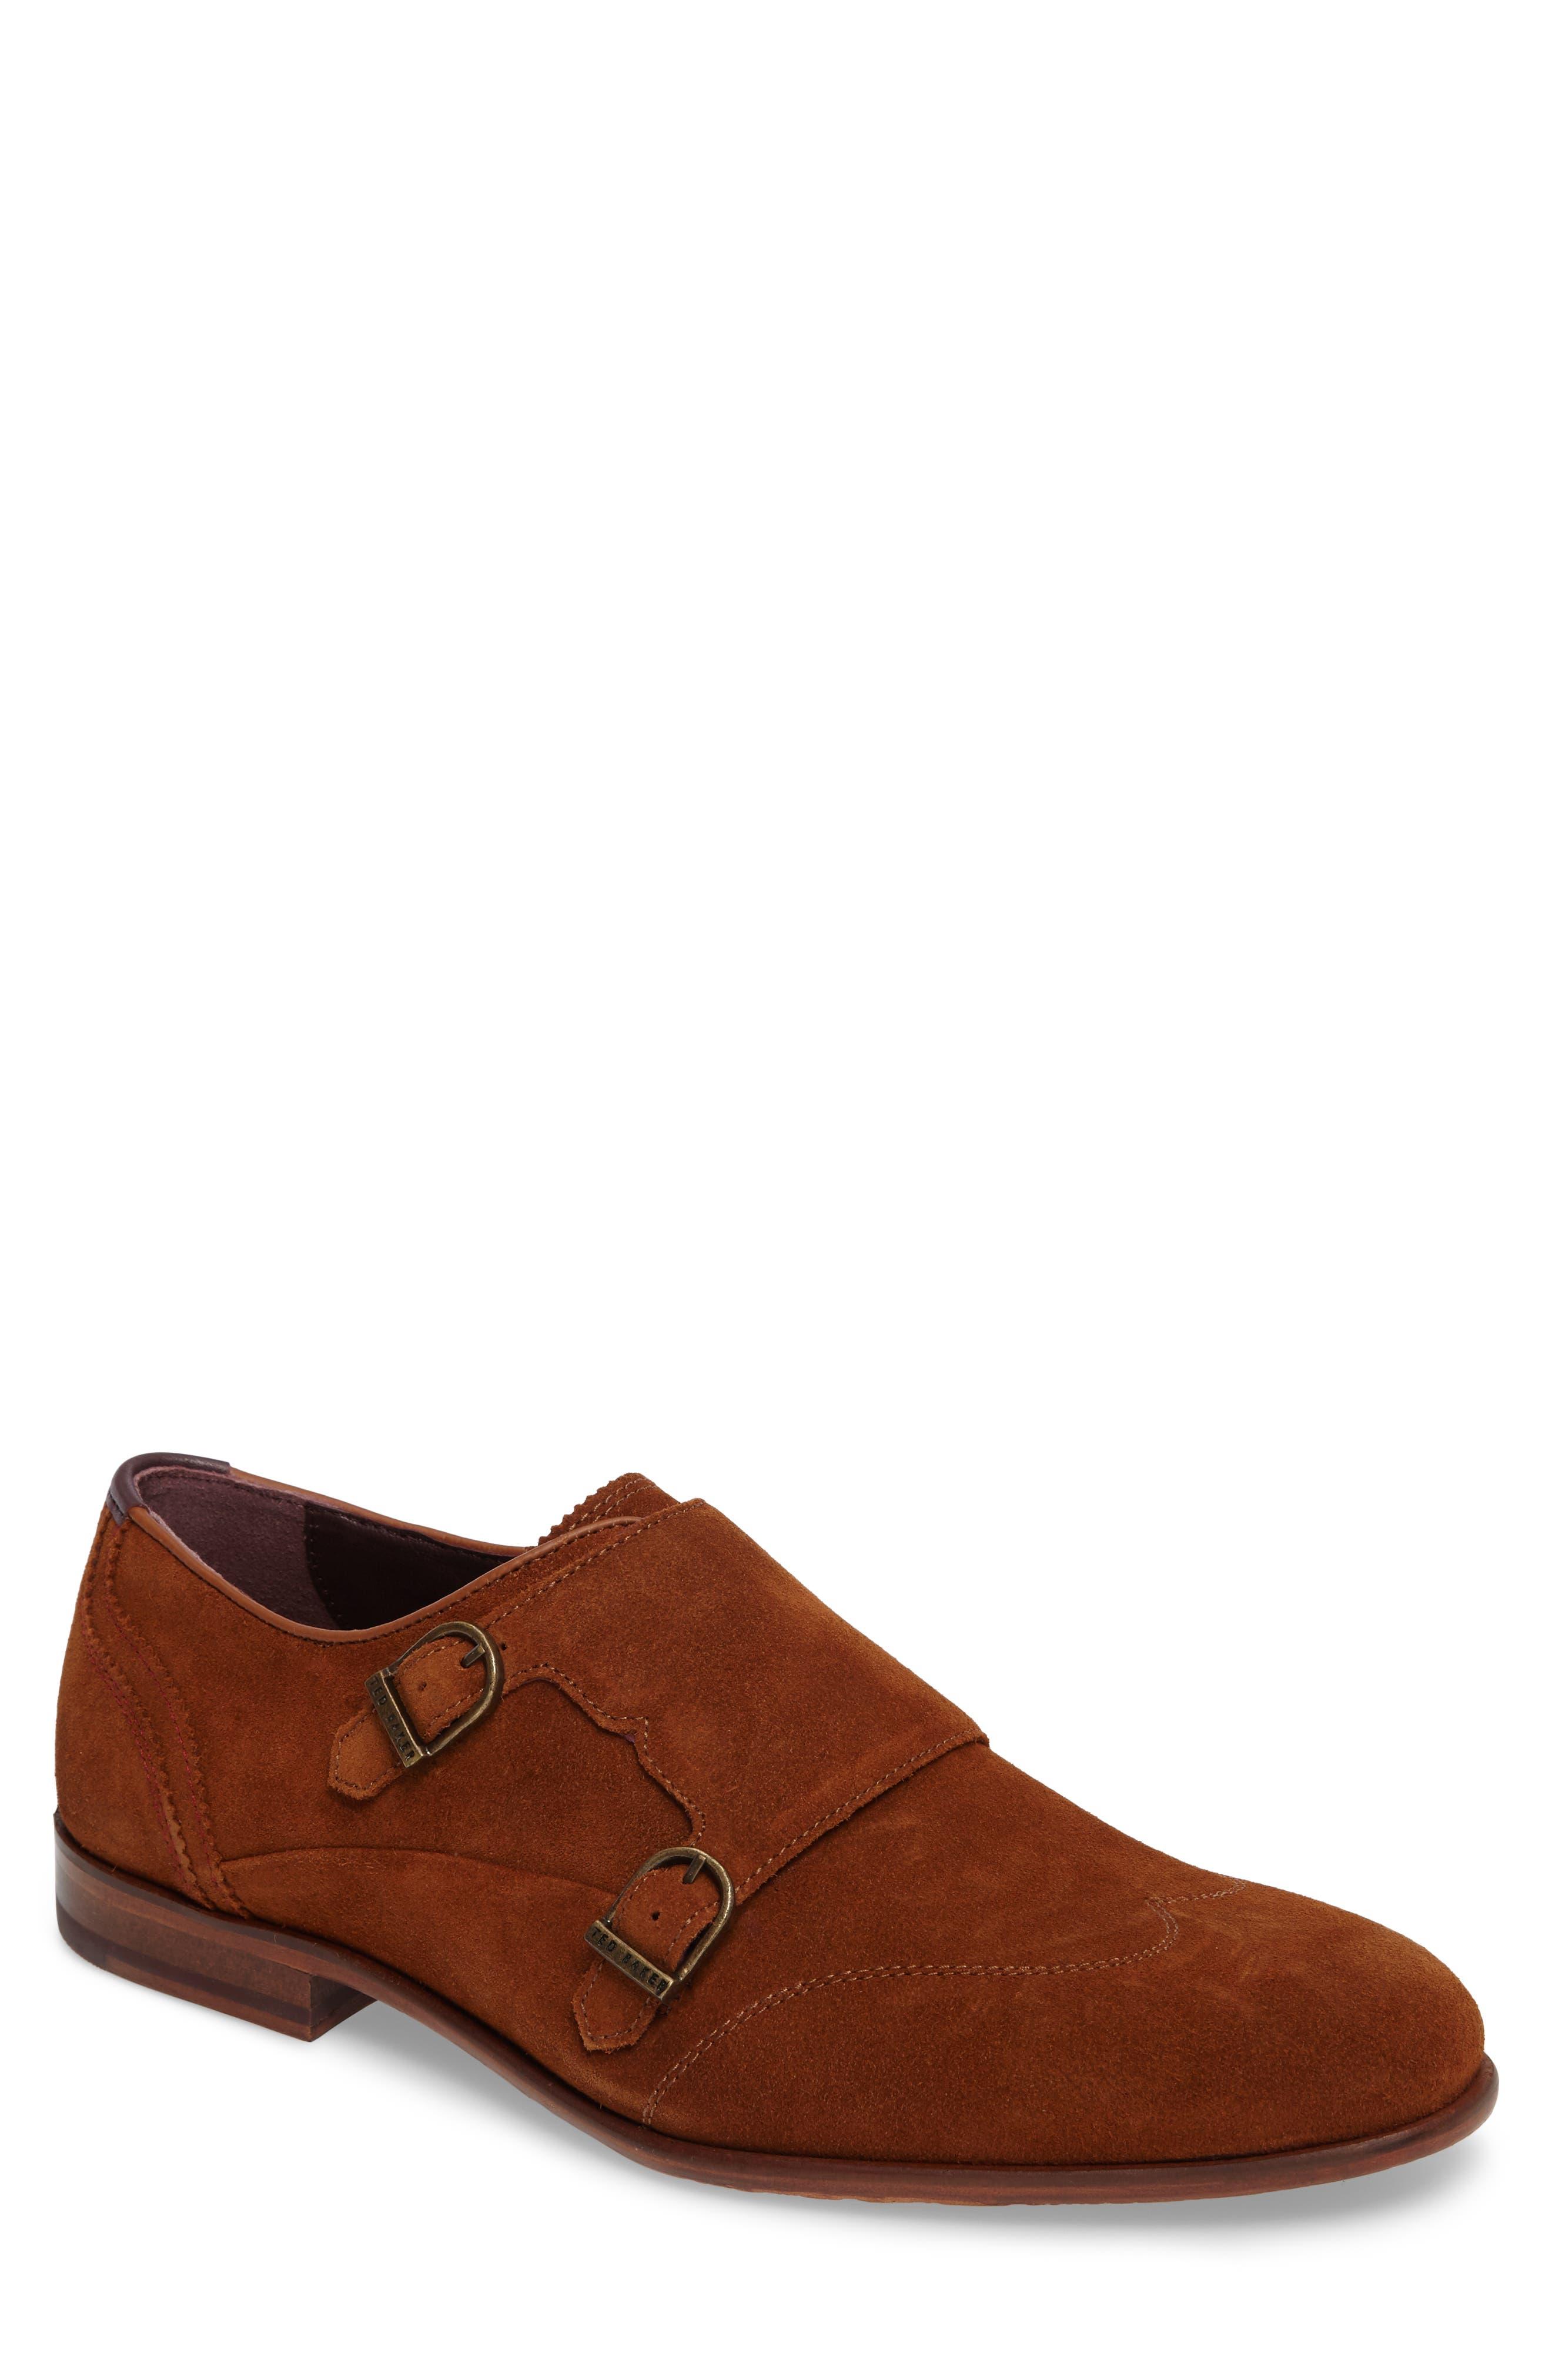 Rovere Wingtip Monk Shoe,                             Main thumbnail 1, color,                             TAN SUEDE